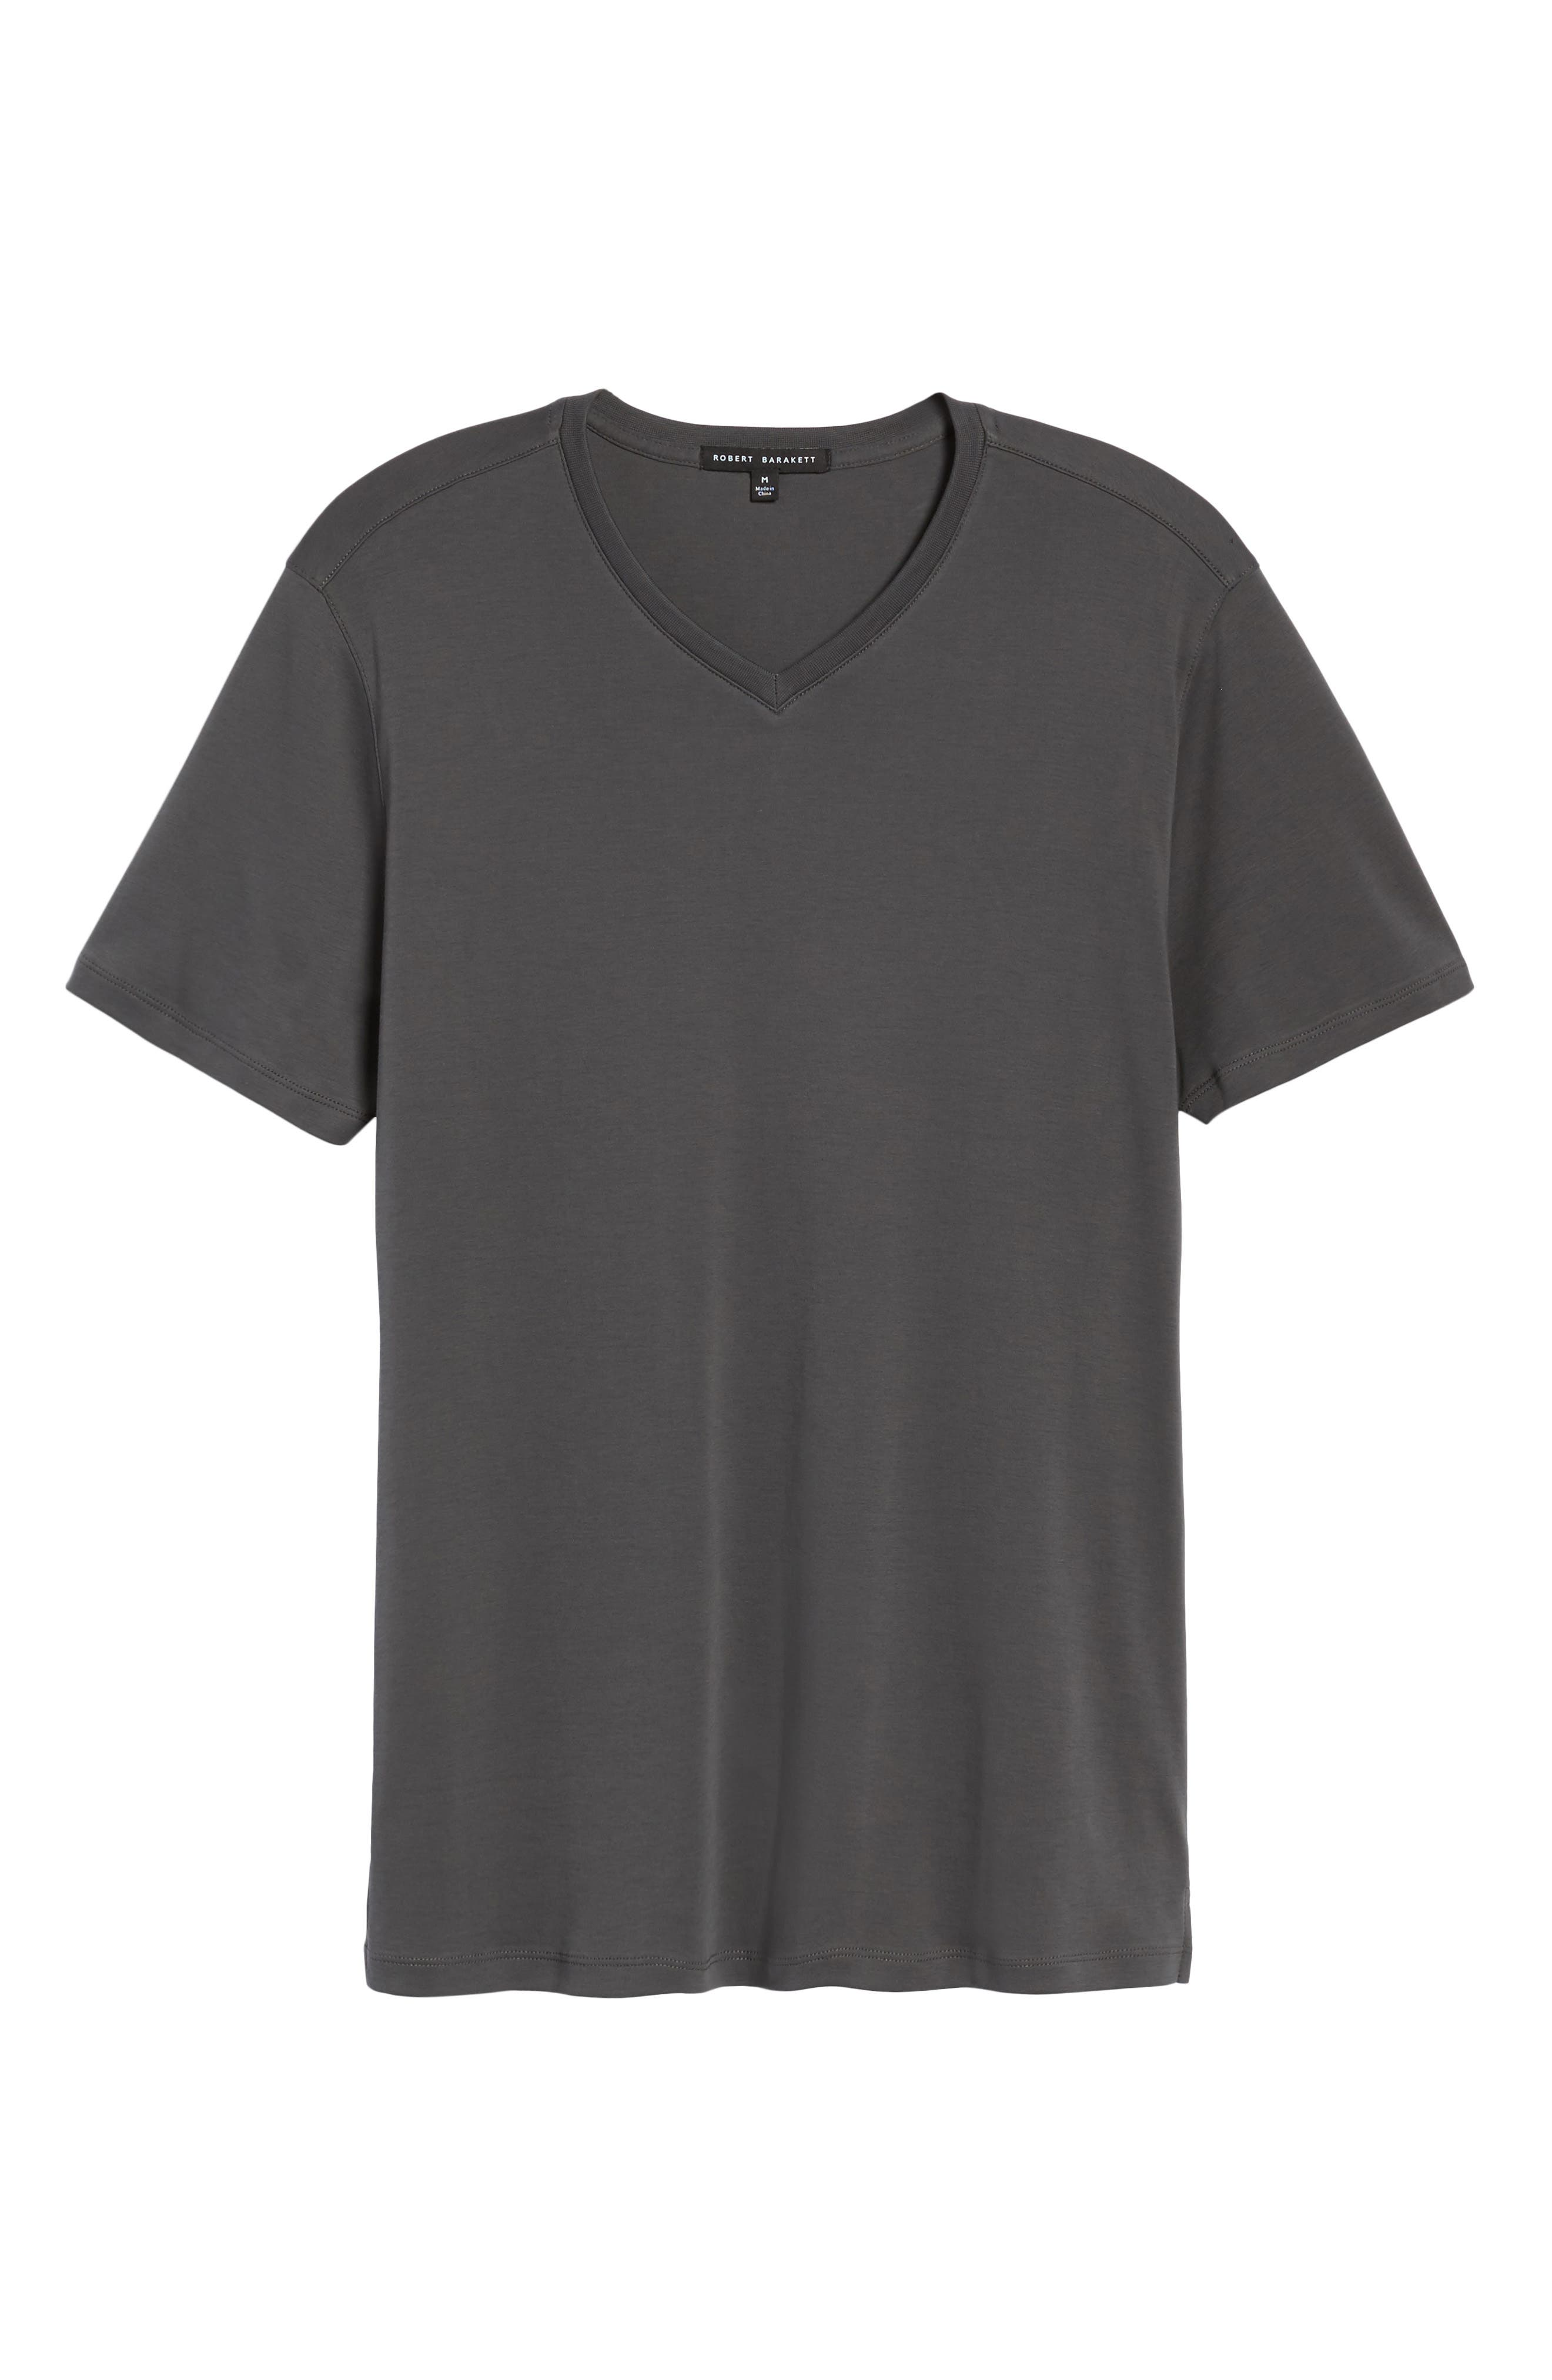 ROBERT BARAKETT, Georgia Regular Fit V-Neck T-Shirt, Alternate thumbnail 6, color, IRON